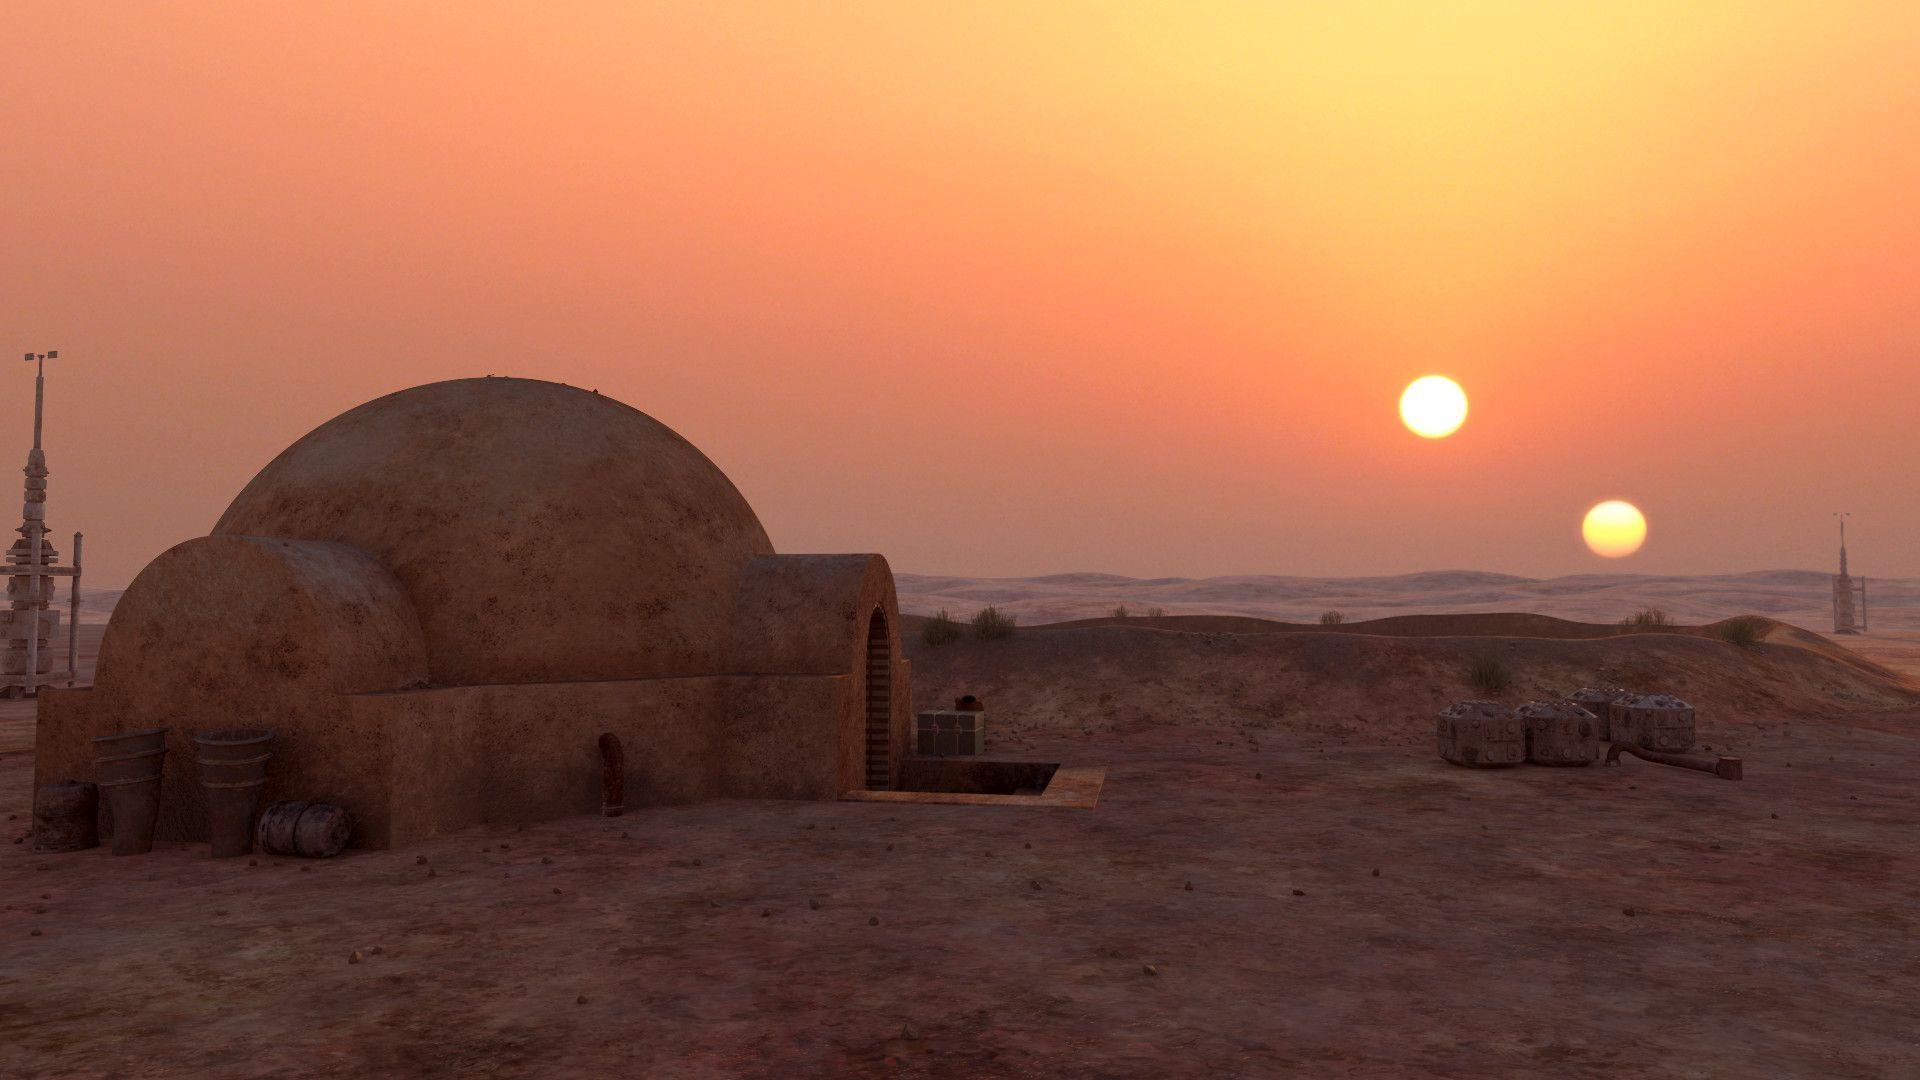 35 Tatooine Wallpapers Download At Wallpaperbro Star Wars Background Star Wars Planets Star Wars Wallpaper